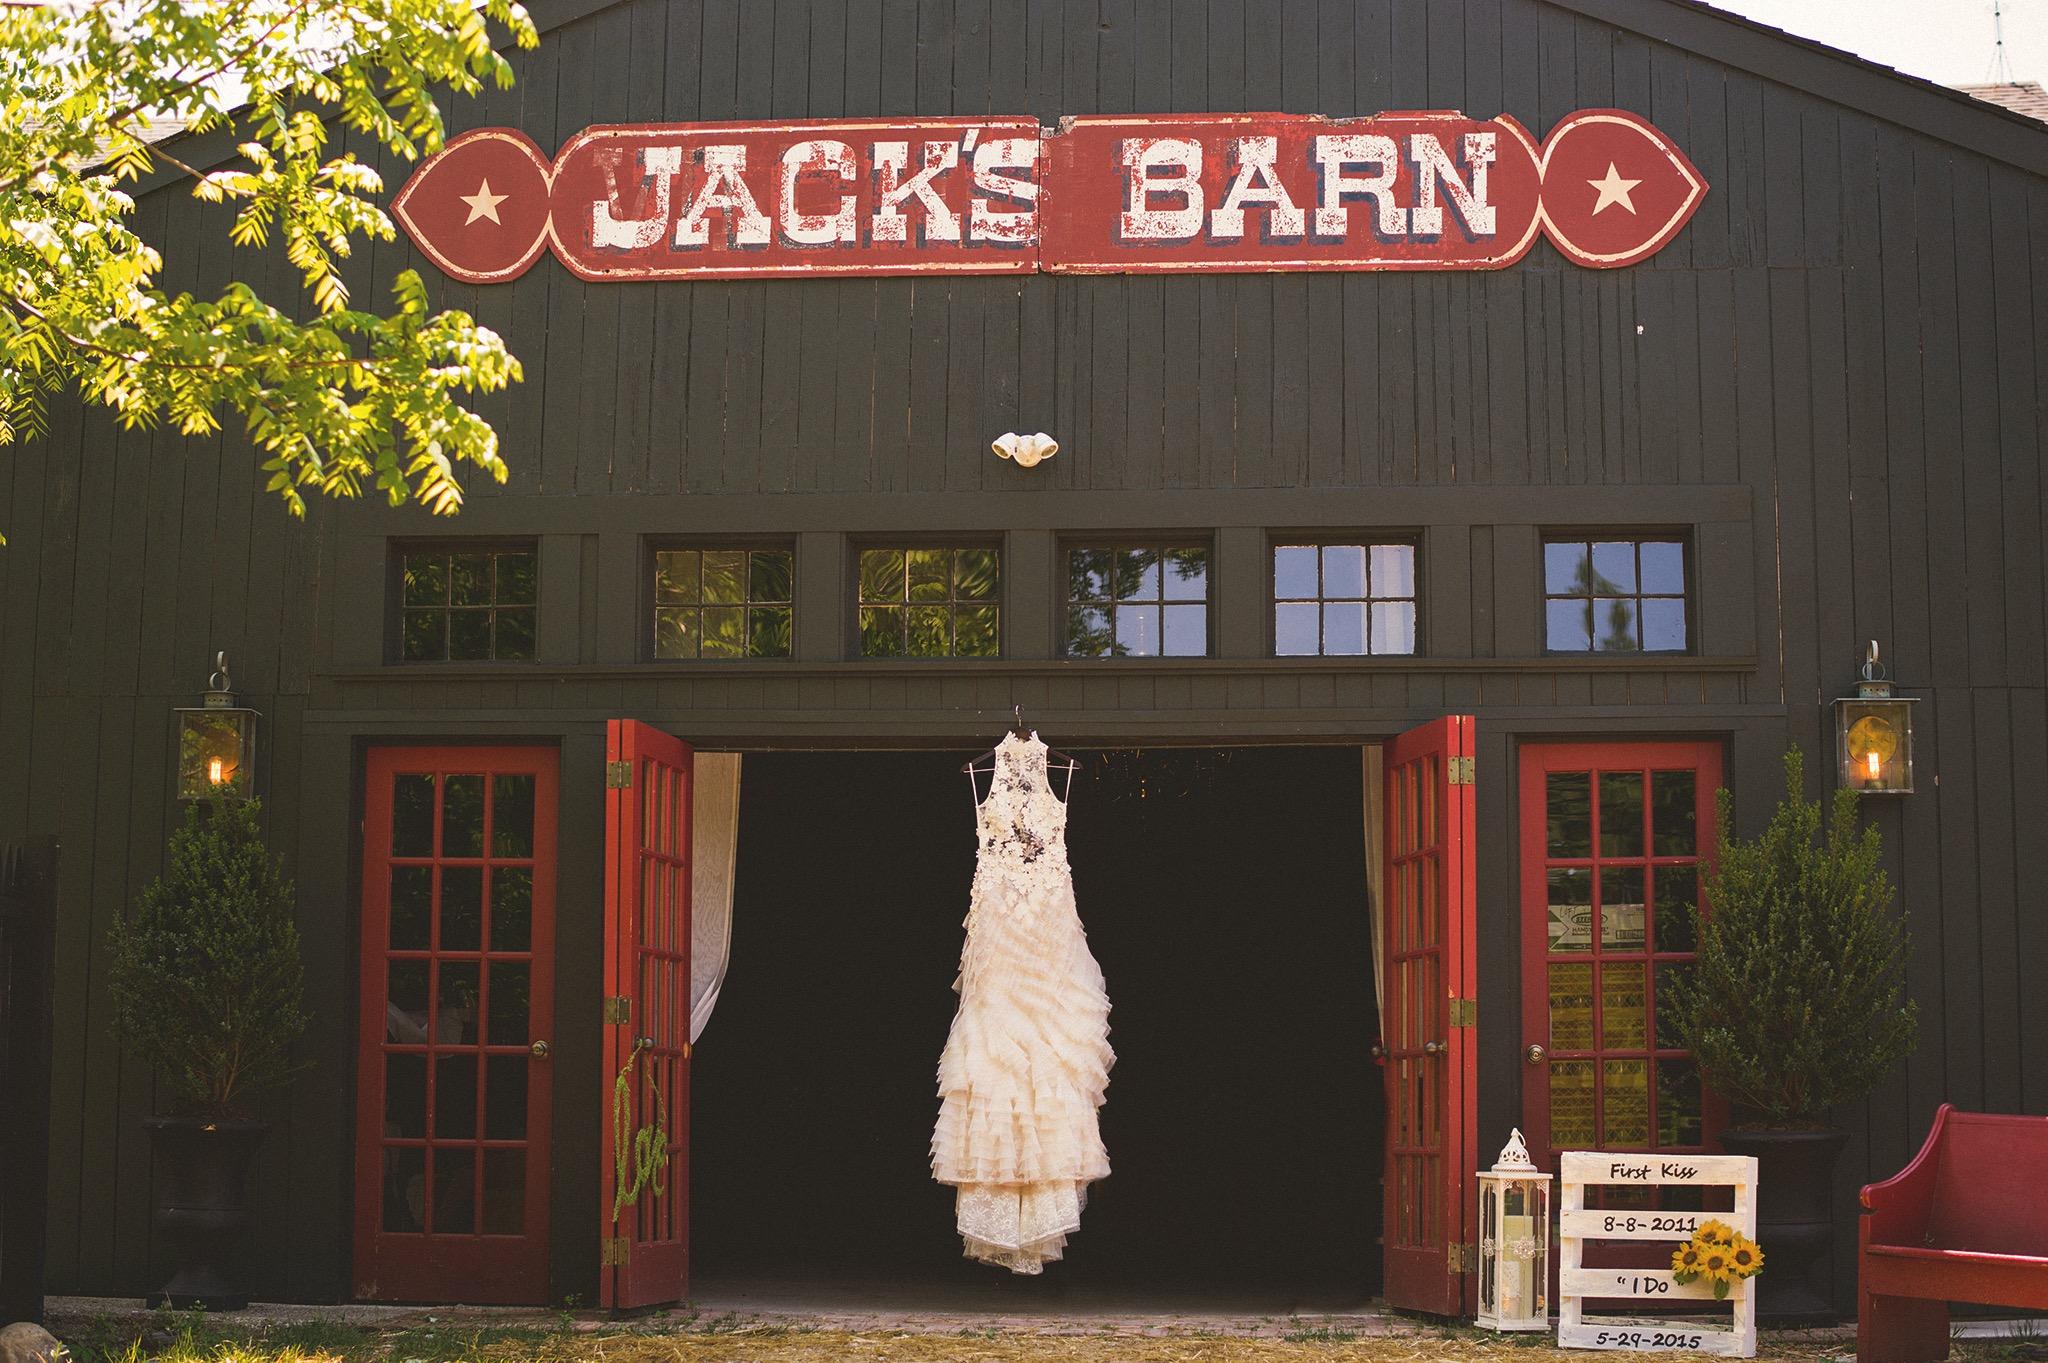 04-jacks-barn-wedding.jpg